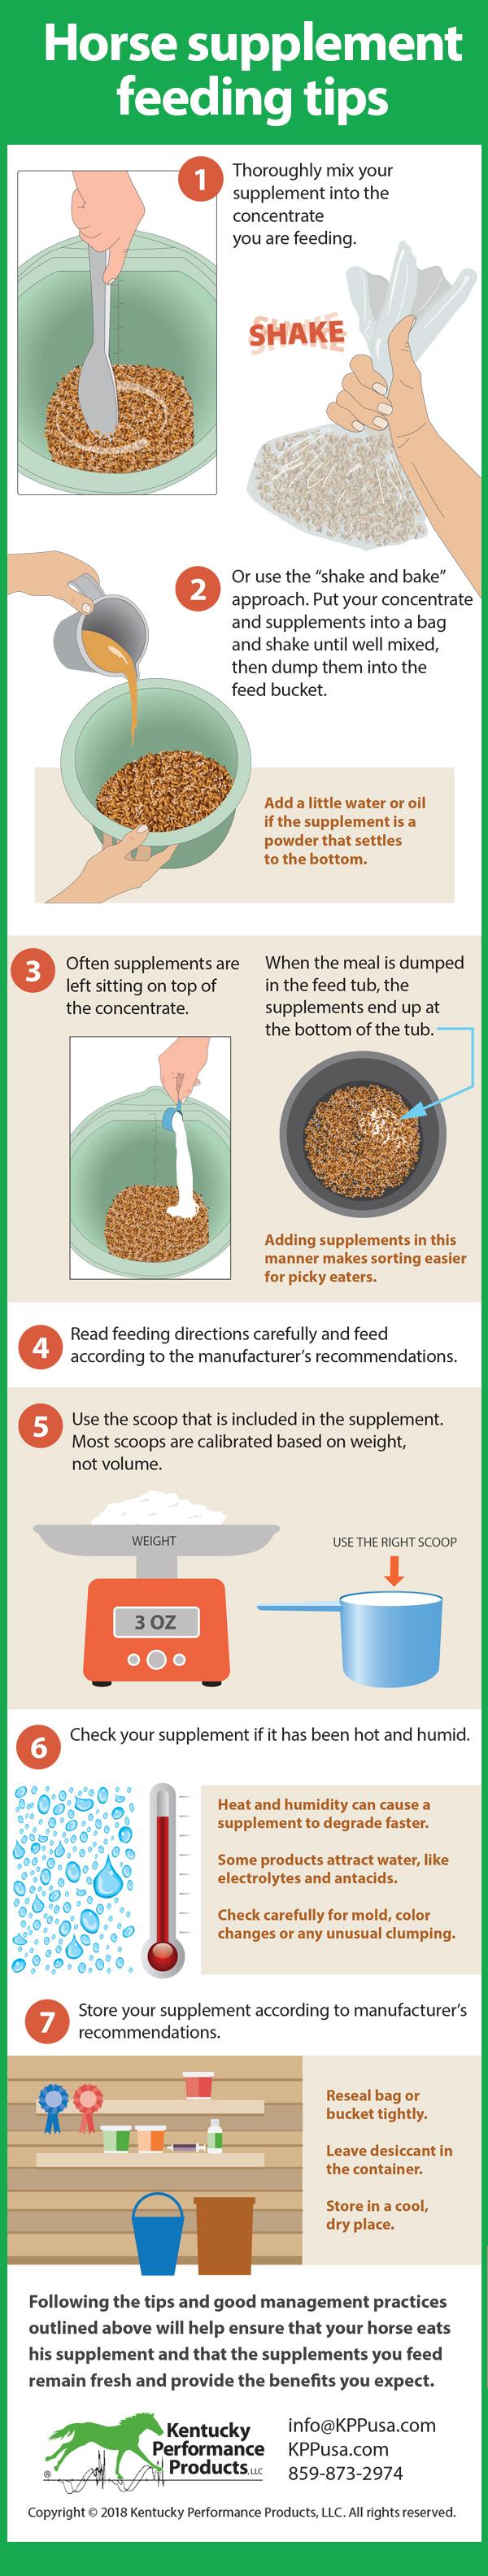 18-213 Horse-Supplement-Feeding-Tips